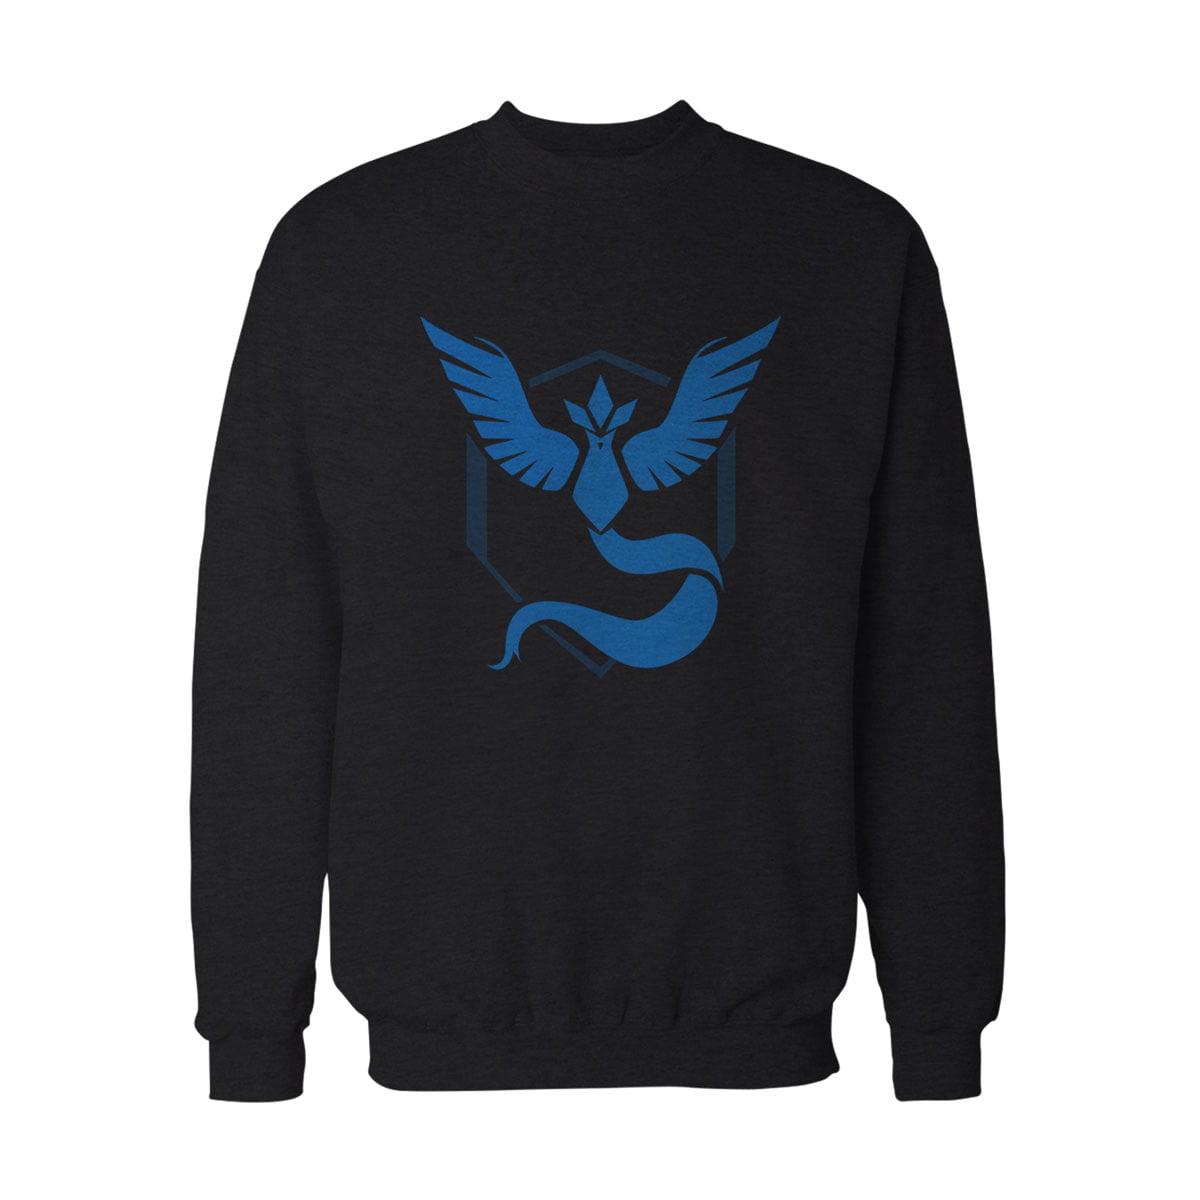 Pokemon Go Mavi Takim Mystic Sweatshirt S - Pokemon Go Team Mystic Unisex Sweatshirt - Figurex